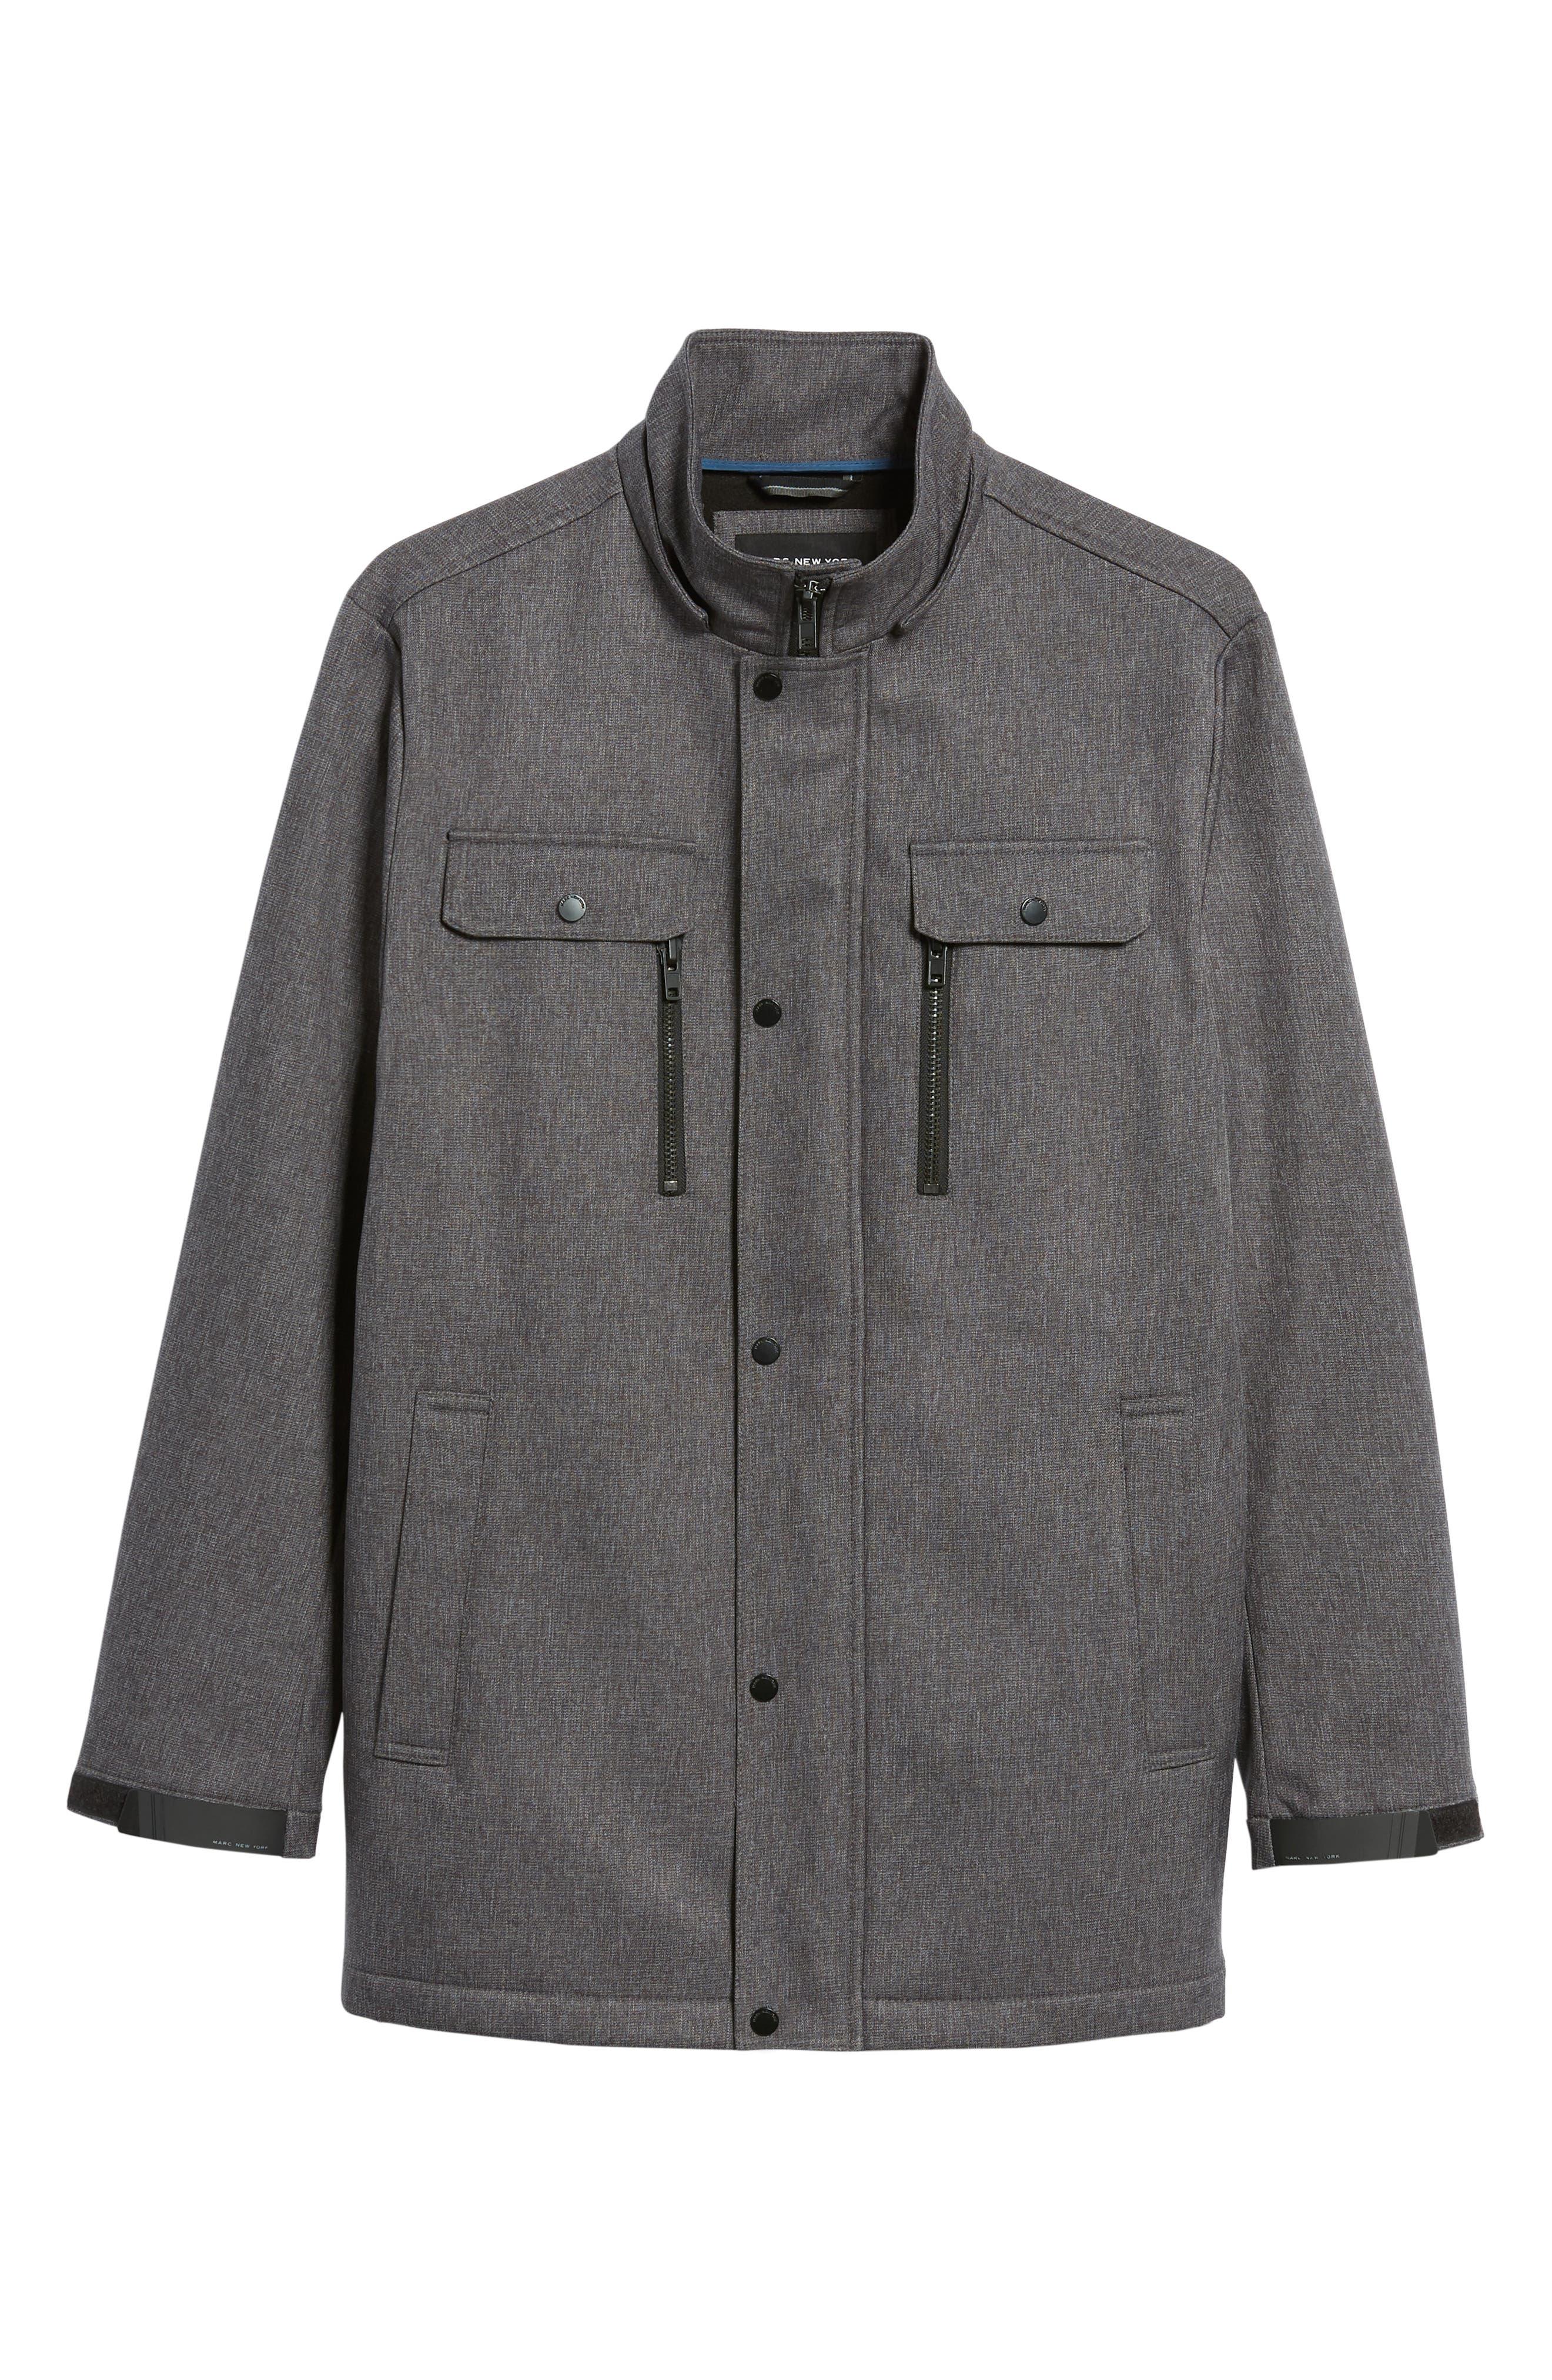 Doyle Soft Shell Jacket,                             Alternate thumbnail 5, color,                             001